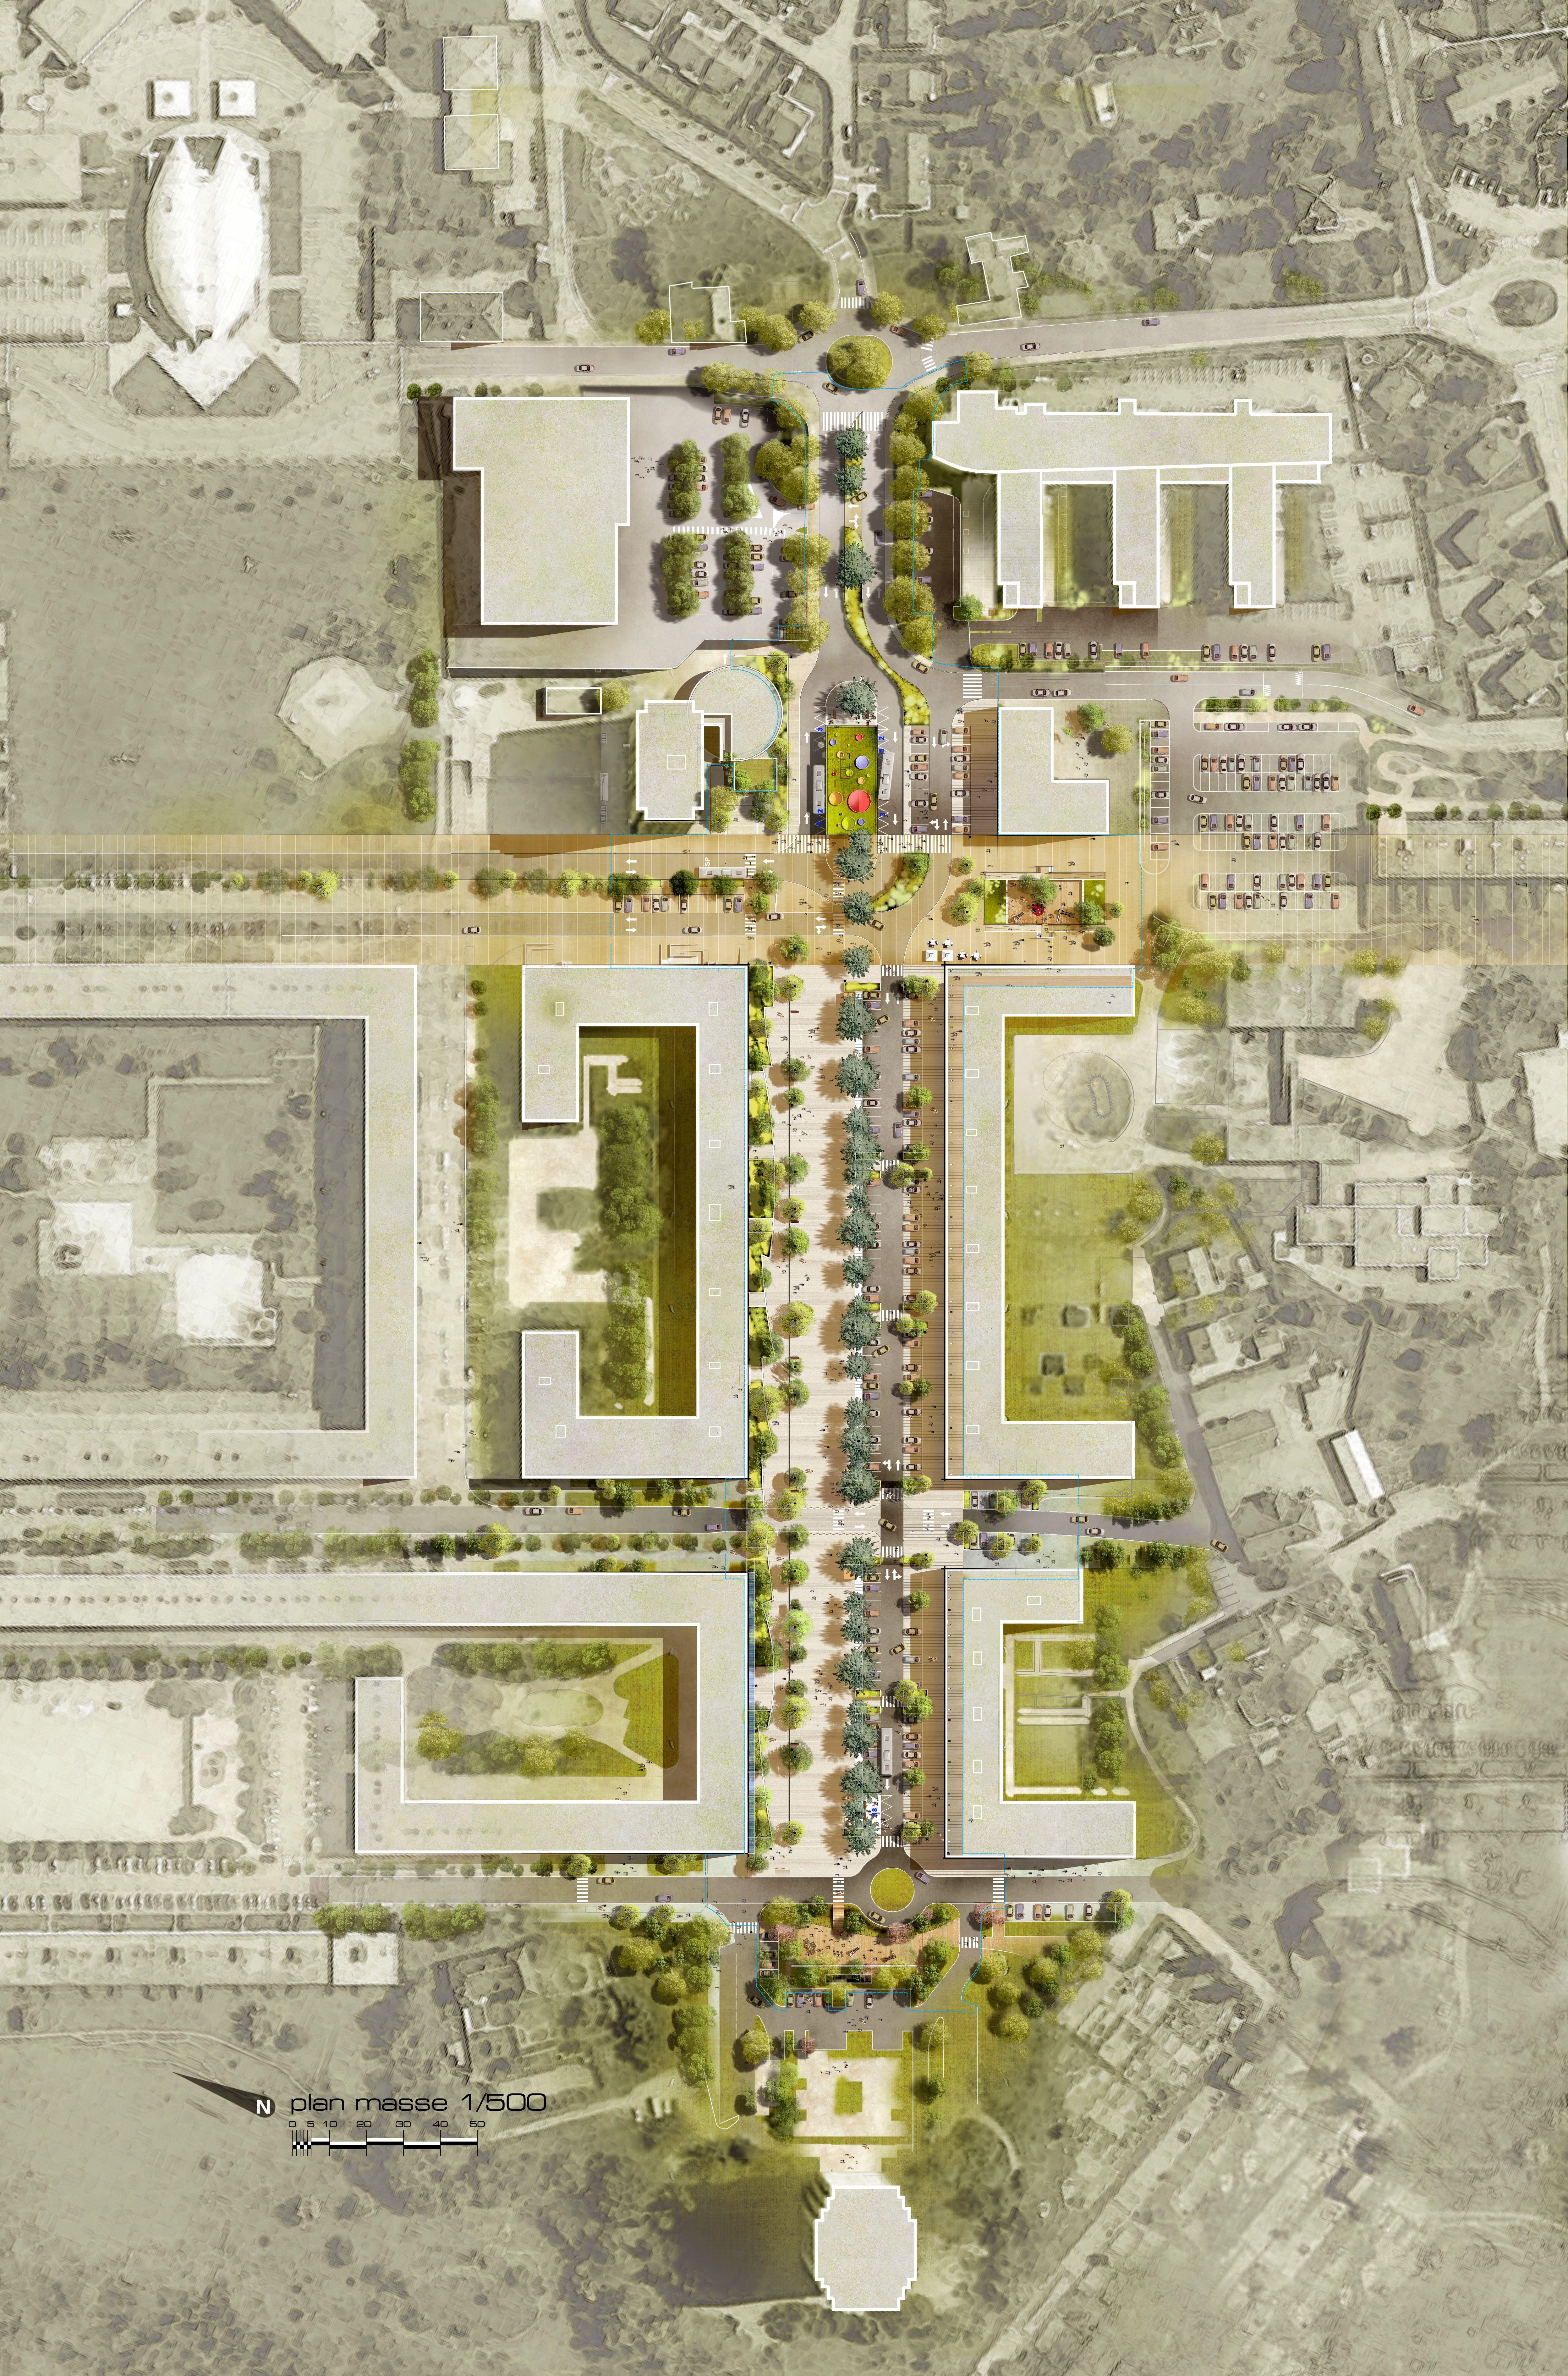 Villesetpaysages Fr Layout Architecture Site Plan Rendering Masterplan Architecture